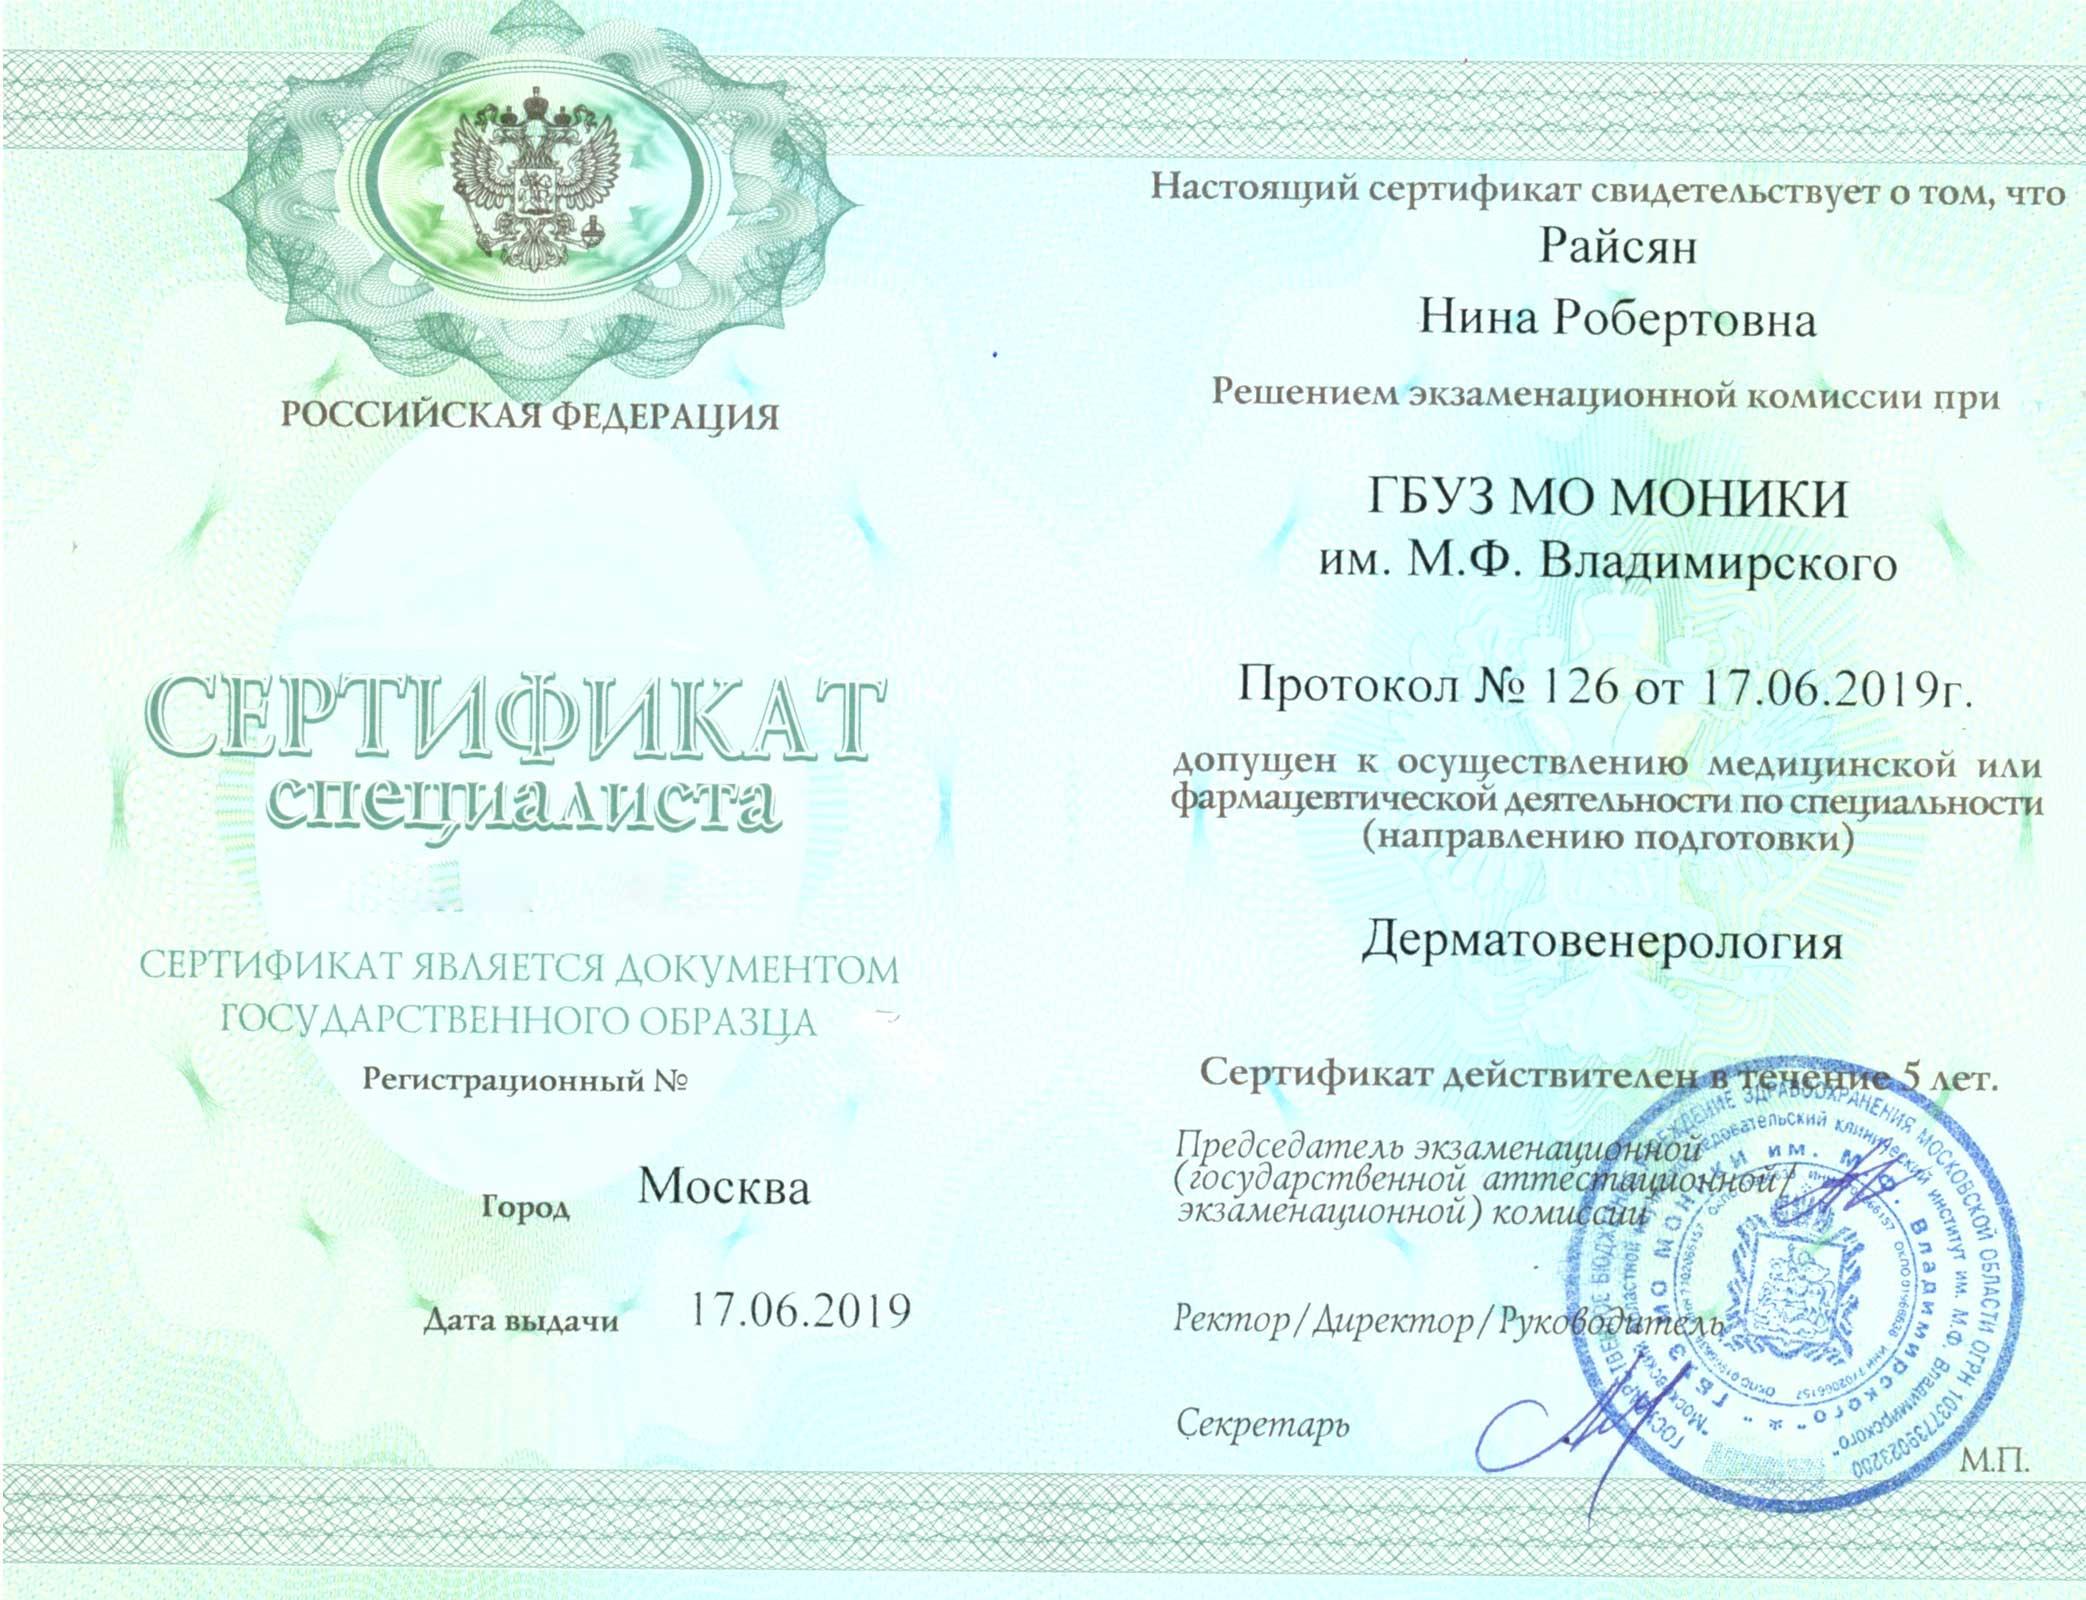 Сертификат специалиста дерматовенеролога Райсян Н.Р.